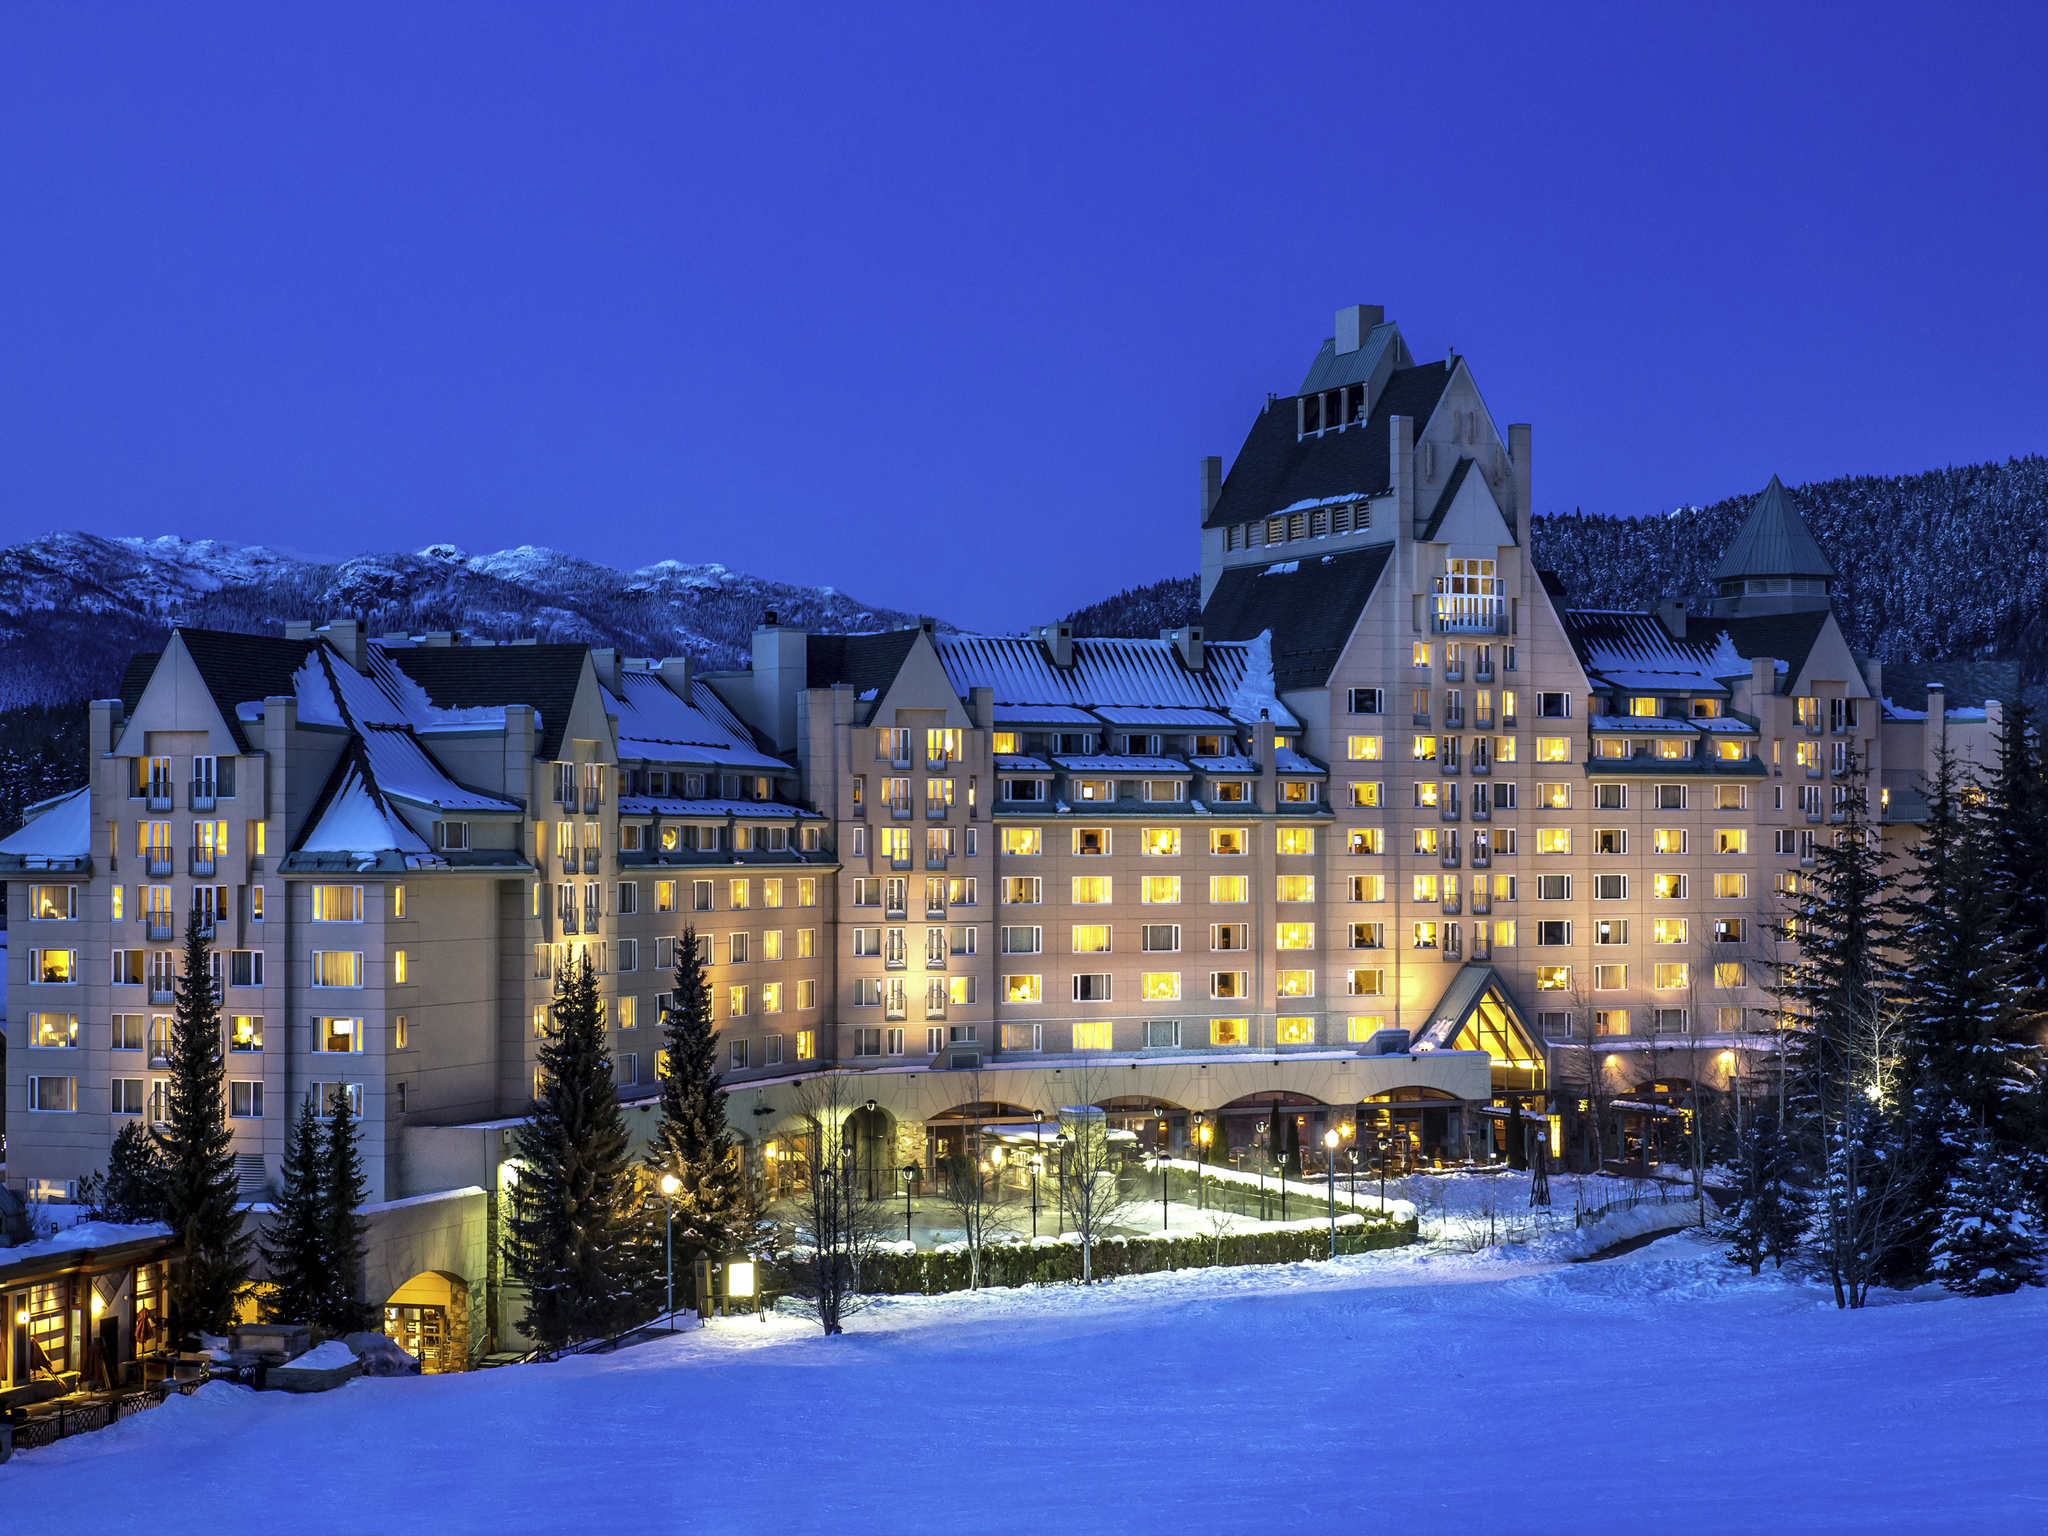 Hotel – Fairmont Chateau Whistler